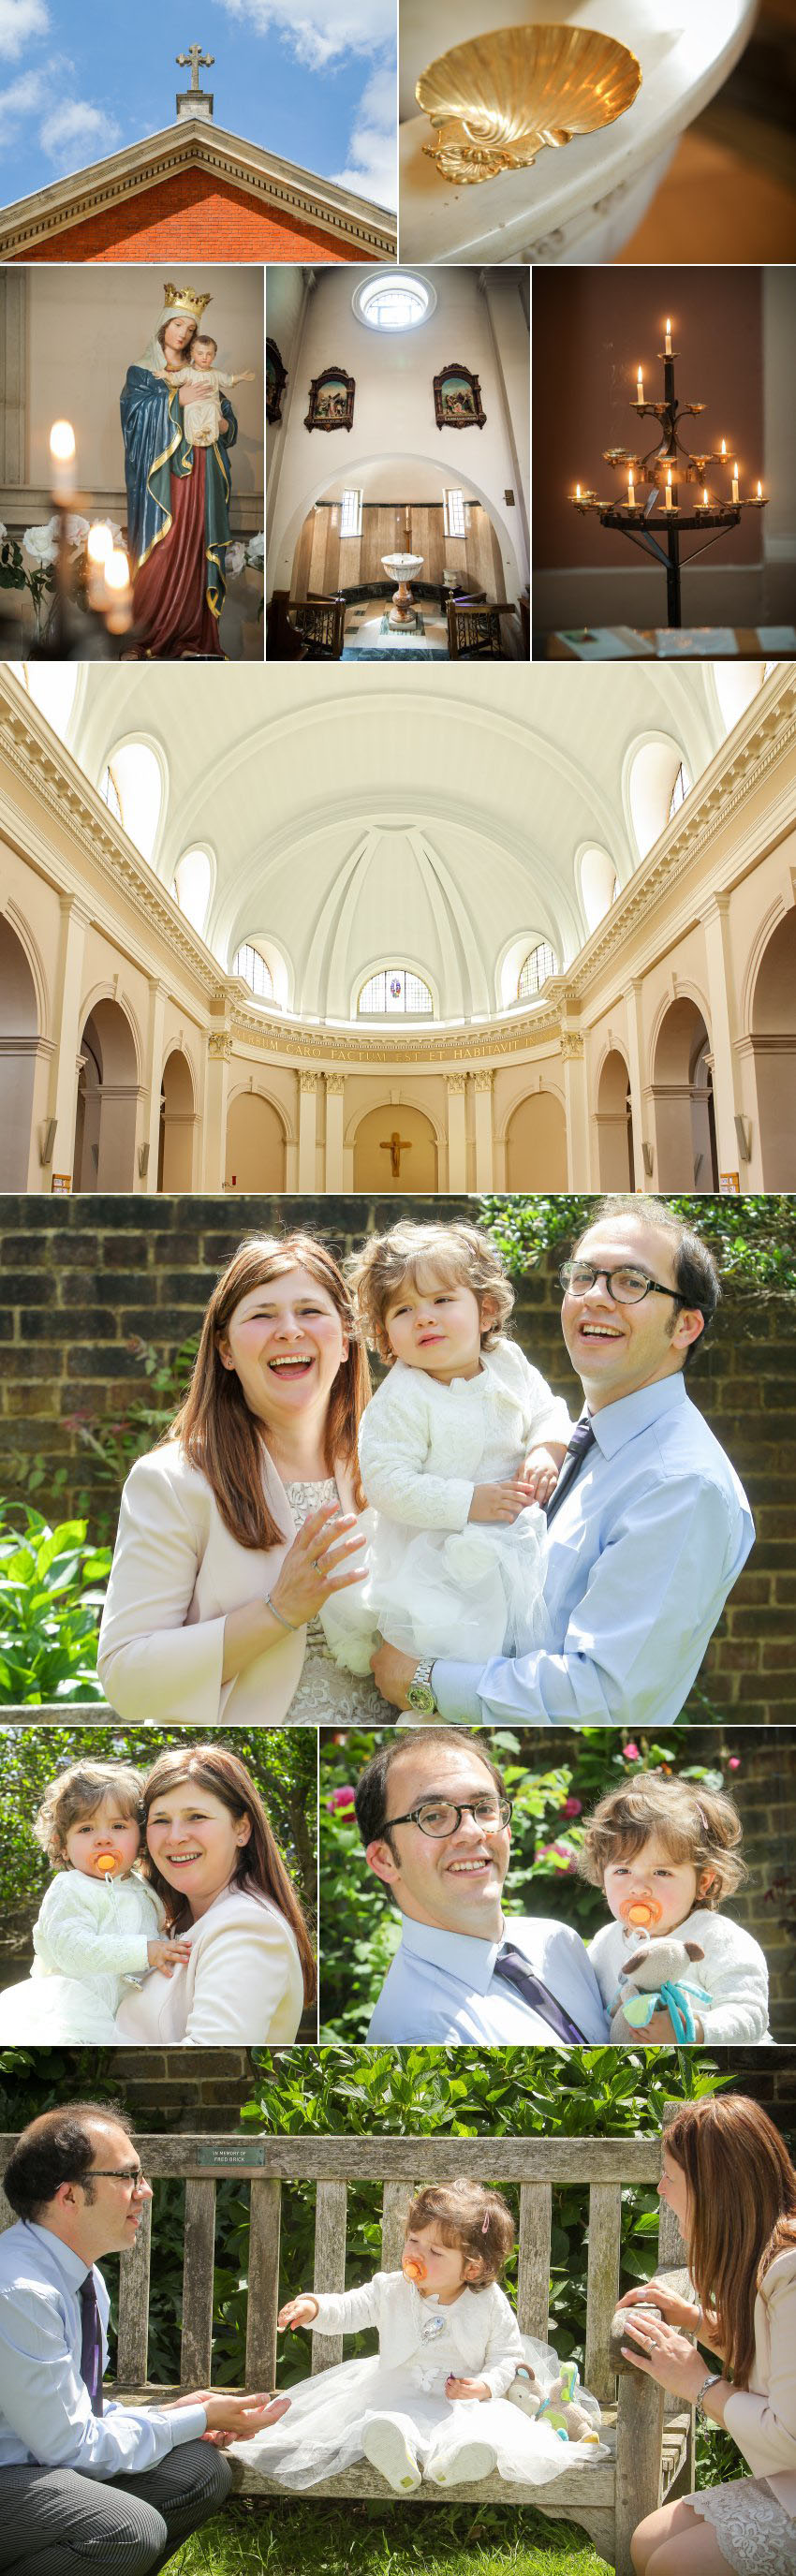 Fiona's Roman Catholic baptism photography in Kew  1